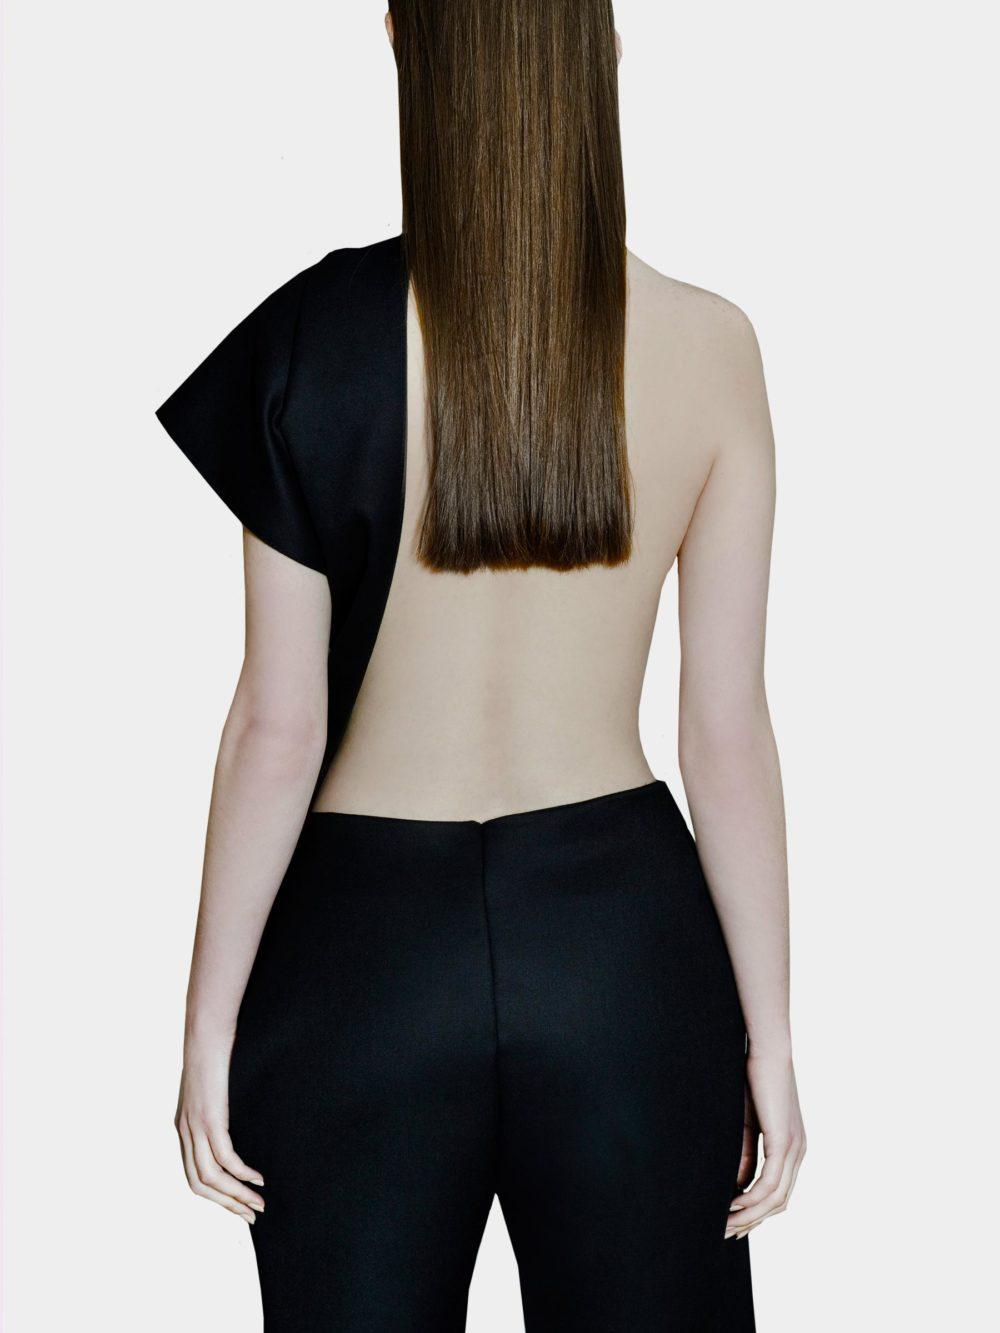 Joanna Organisciak Wool Jumpsuit - available at utopiast.com